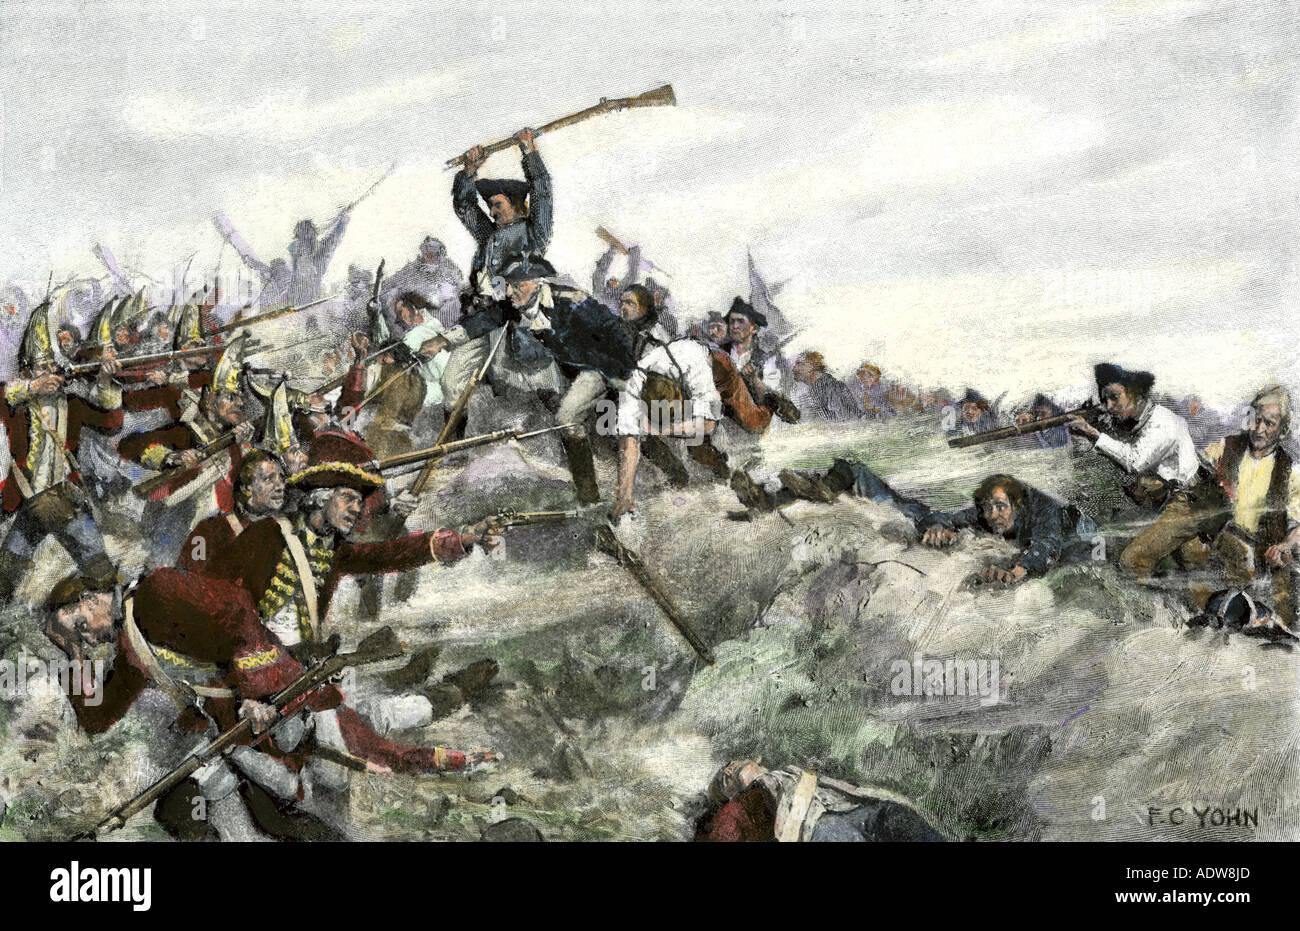 John Stark leading a charge of New Hampshire militia, Battle of Bennington 1777 American Revolution. Hand-colored woodcut of an F.C. Yohn illustration - Stock Image